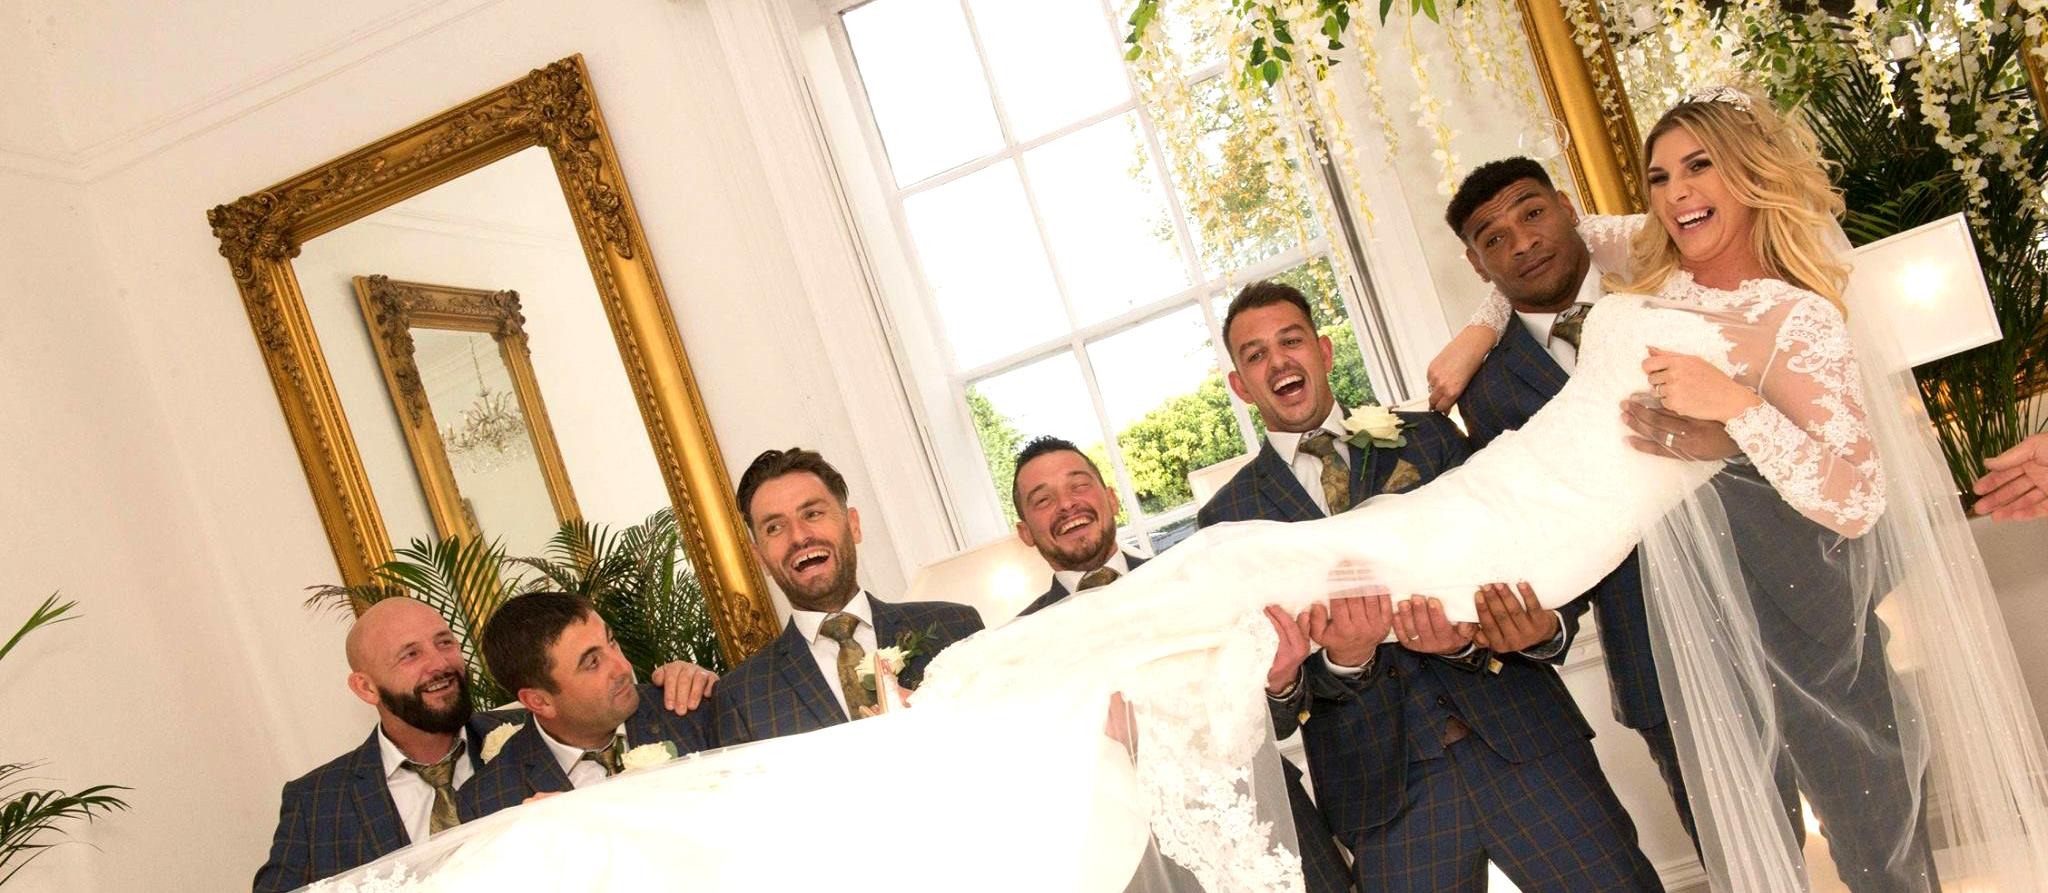 Bawtry Hall Weddings